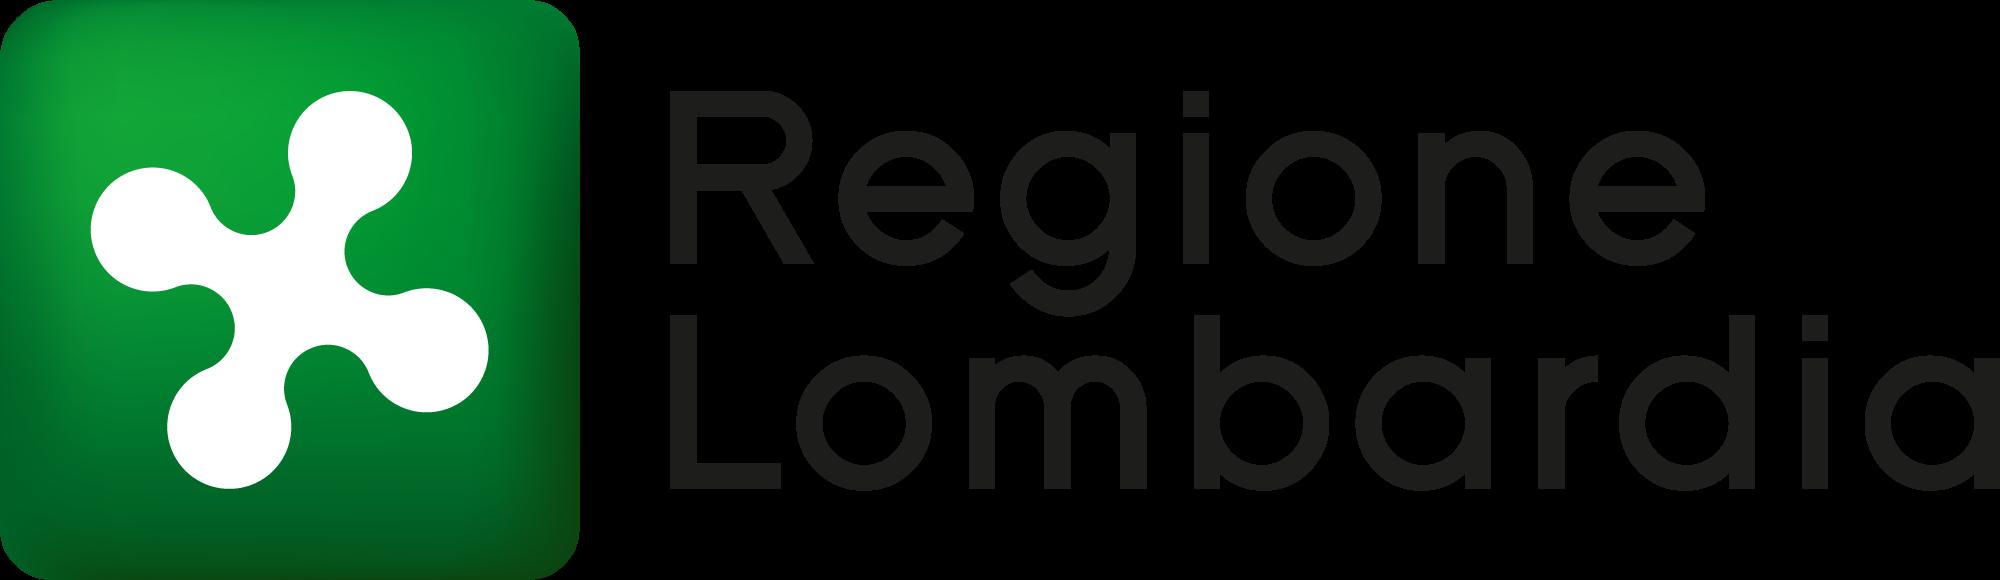 regione-lombardia-logo